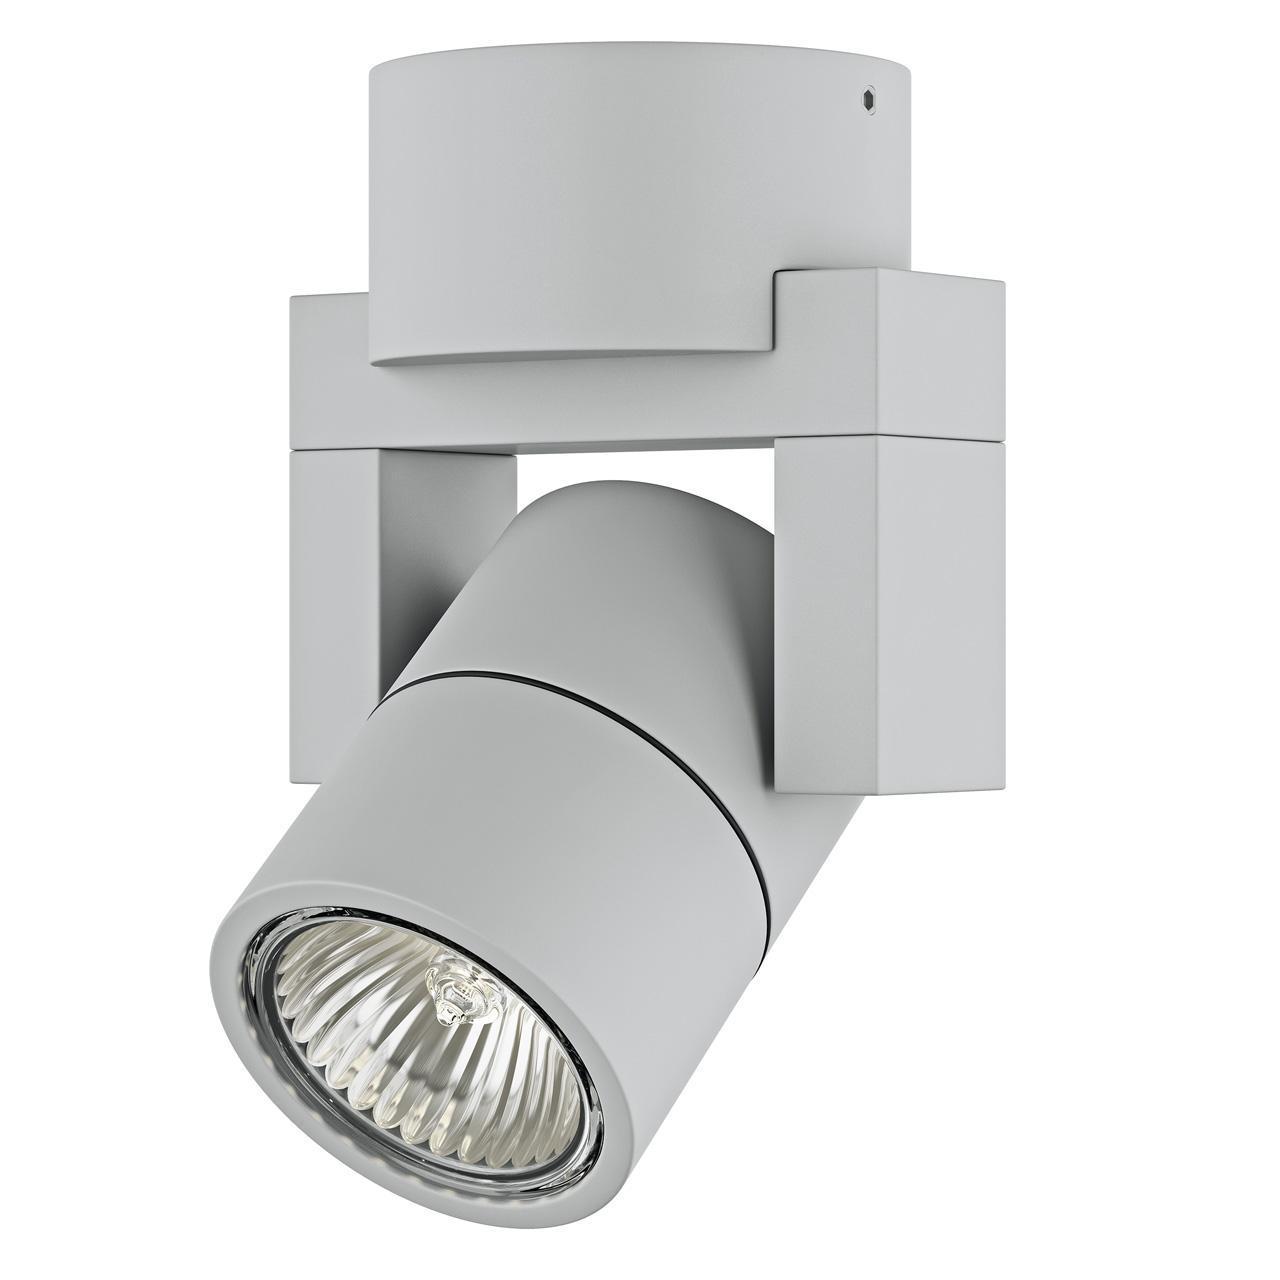 Потолочный светильник Lightstar Illumo L1 051040